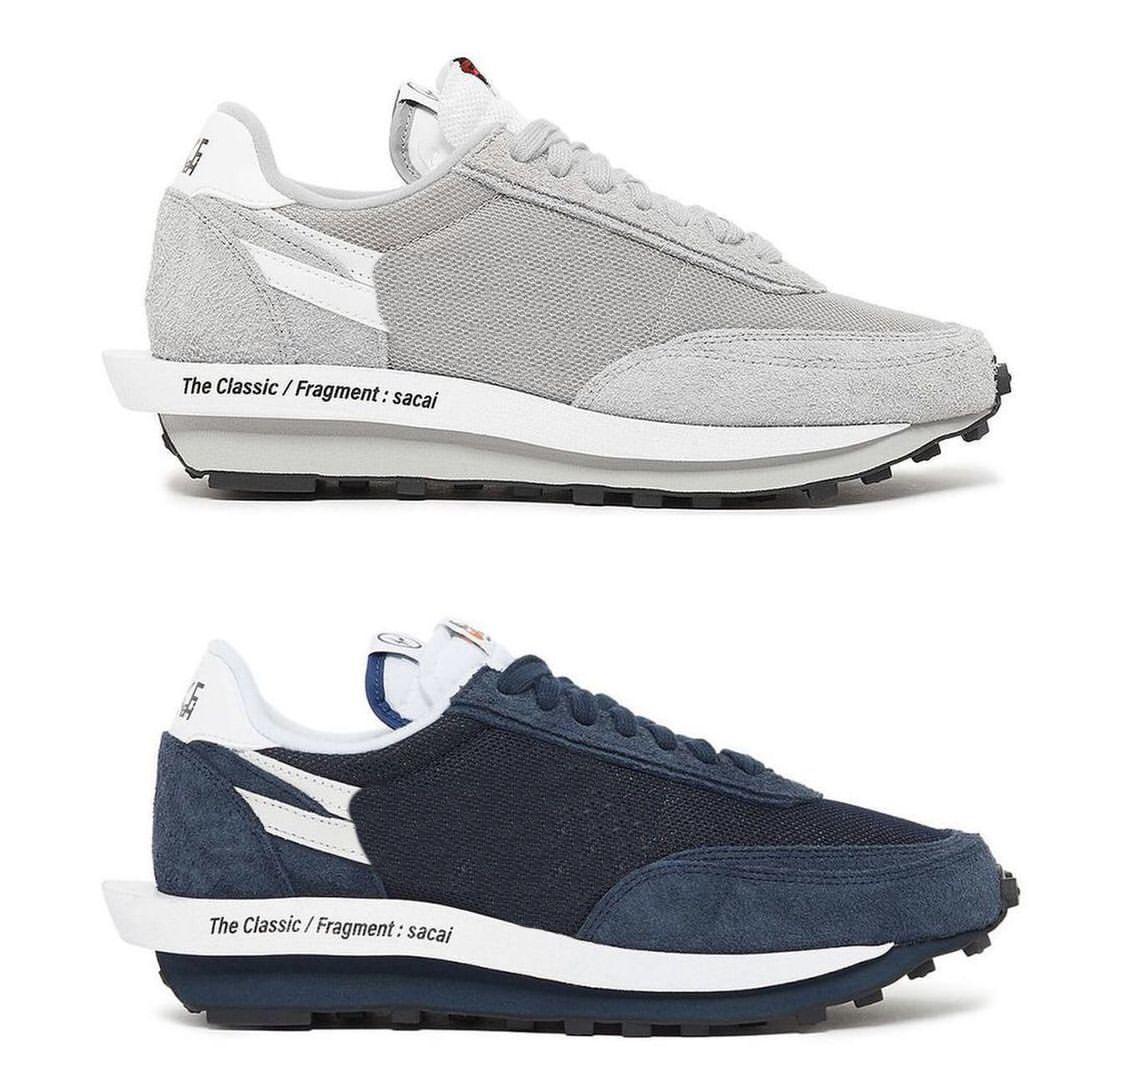 2021 Authentisches Fragment Sacais Schuhe Wolf Grau Blau Blau Oberklumpen Vaporwaffle 2.0 Waffel LDV Schwarz Weiß Männer Frauen Sport Outdoor Sneakers mit Original Box